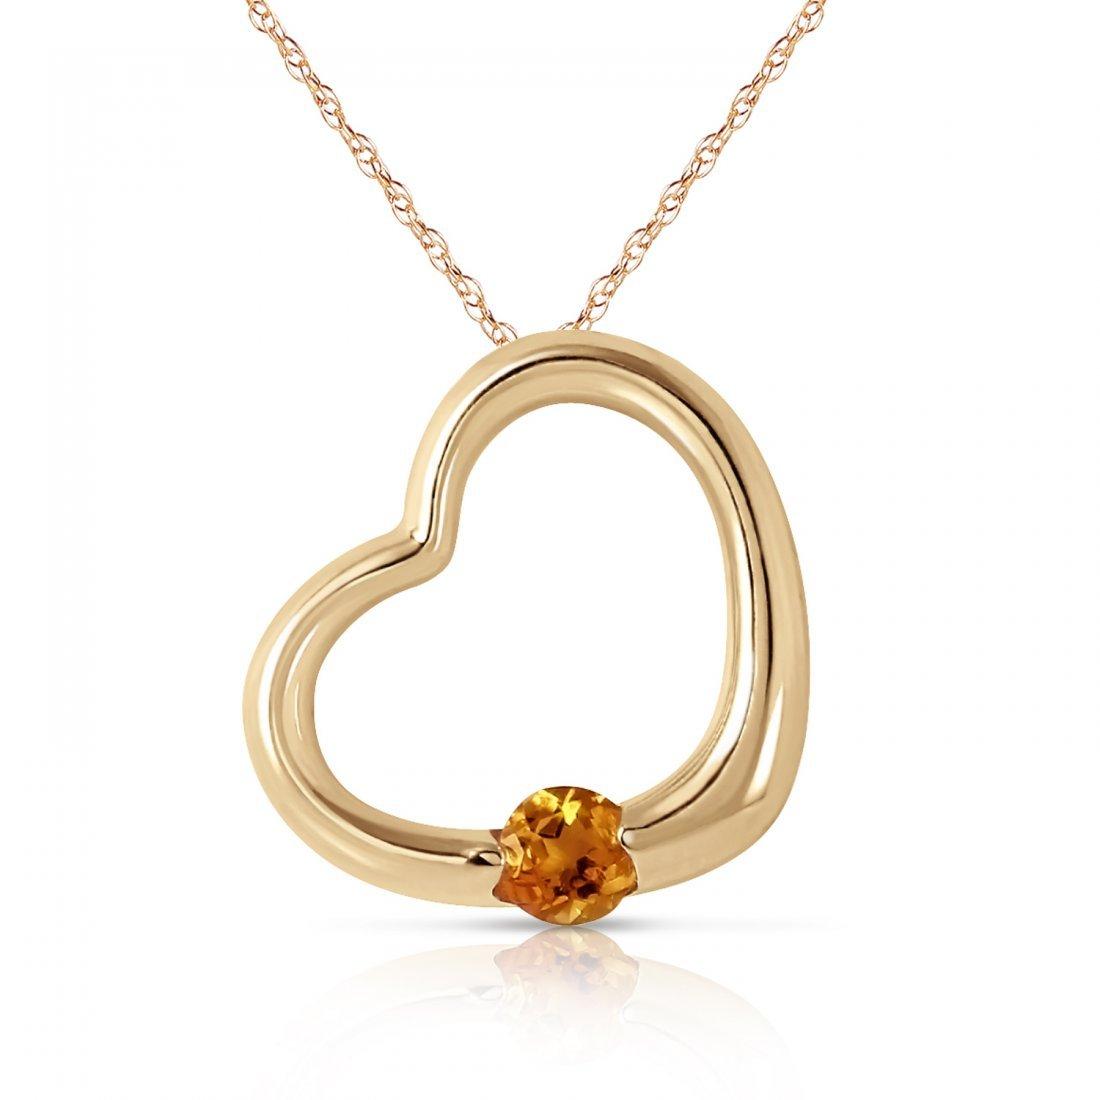 Genuine 0.25 ctw Citrine Necklace Jewelry 14KT Yellow